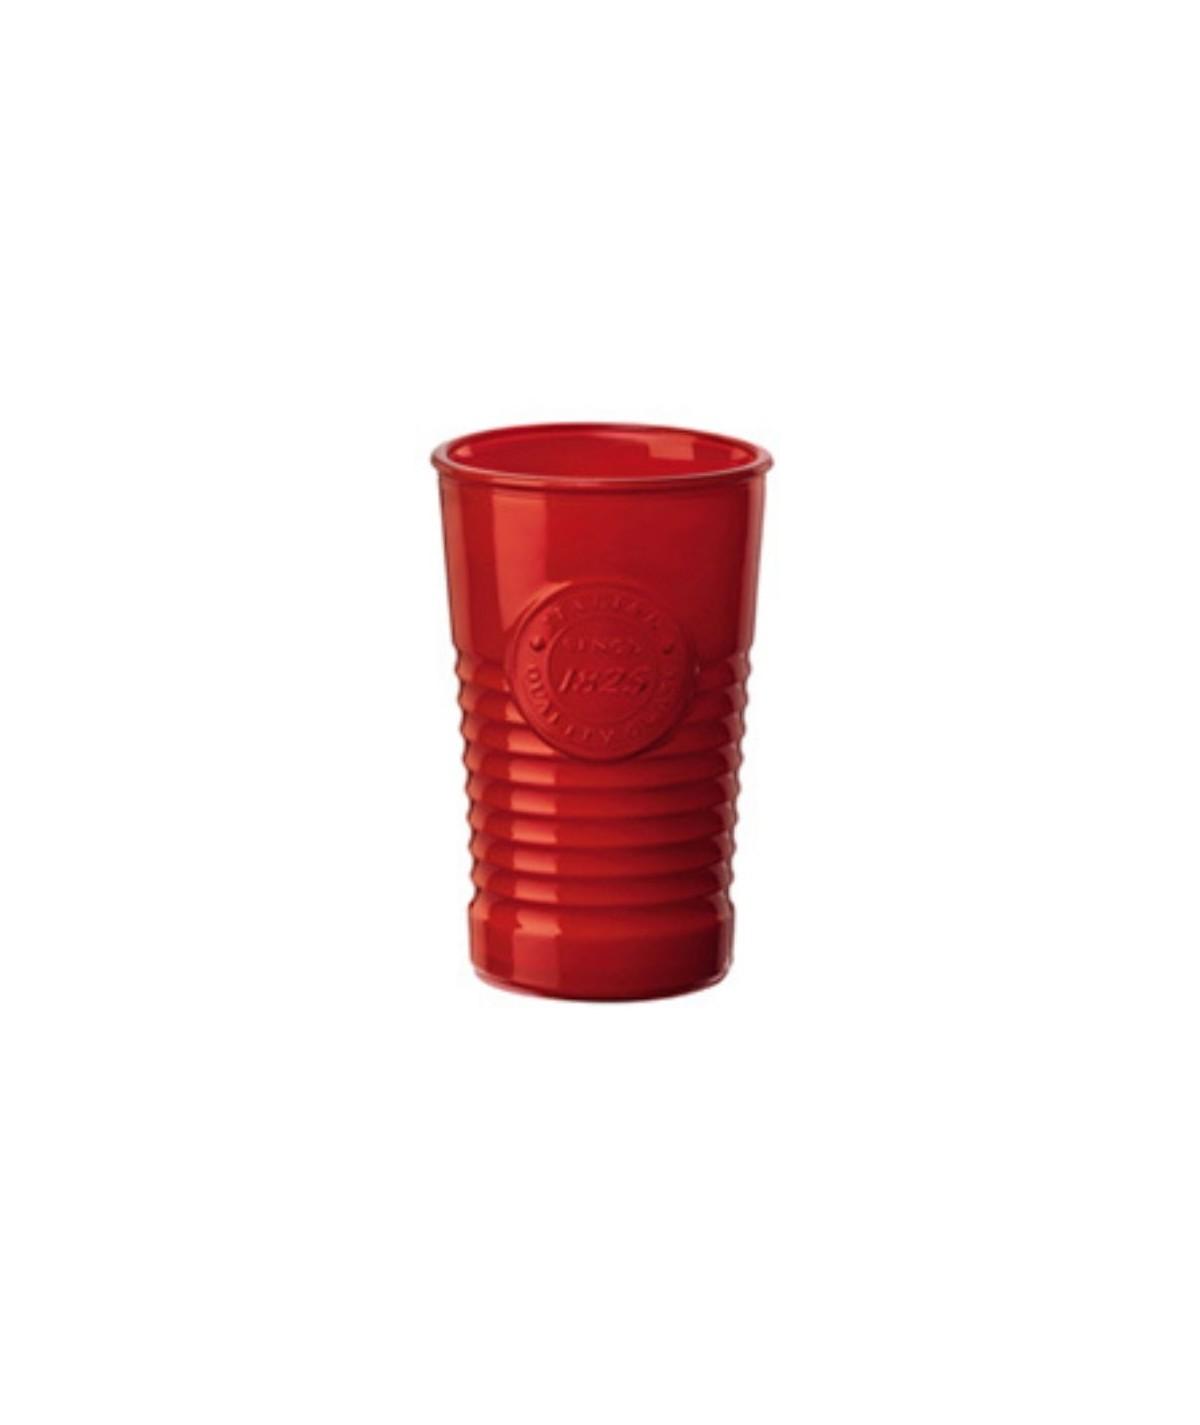 Bicchiere in ceramica rosso...